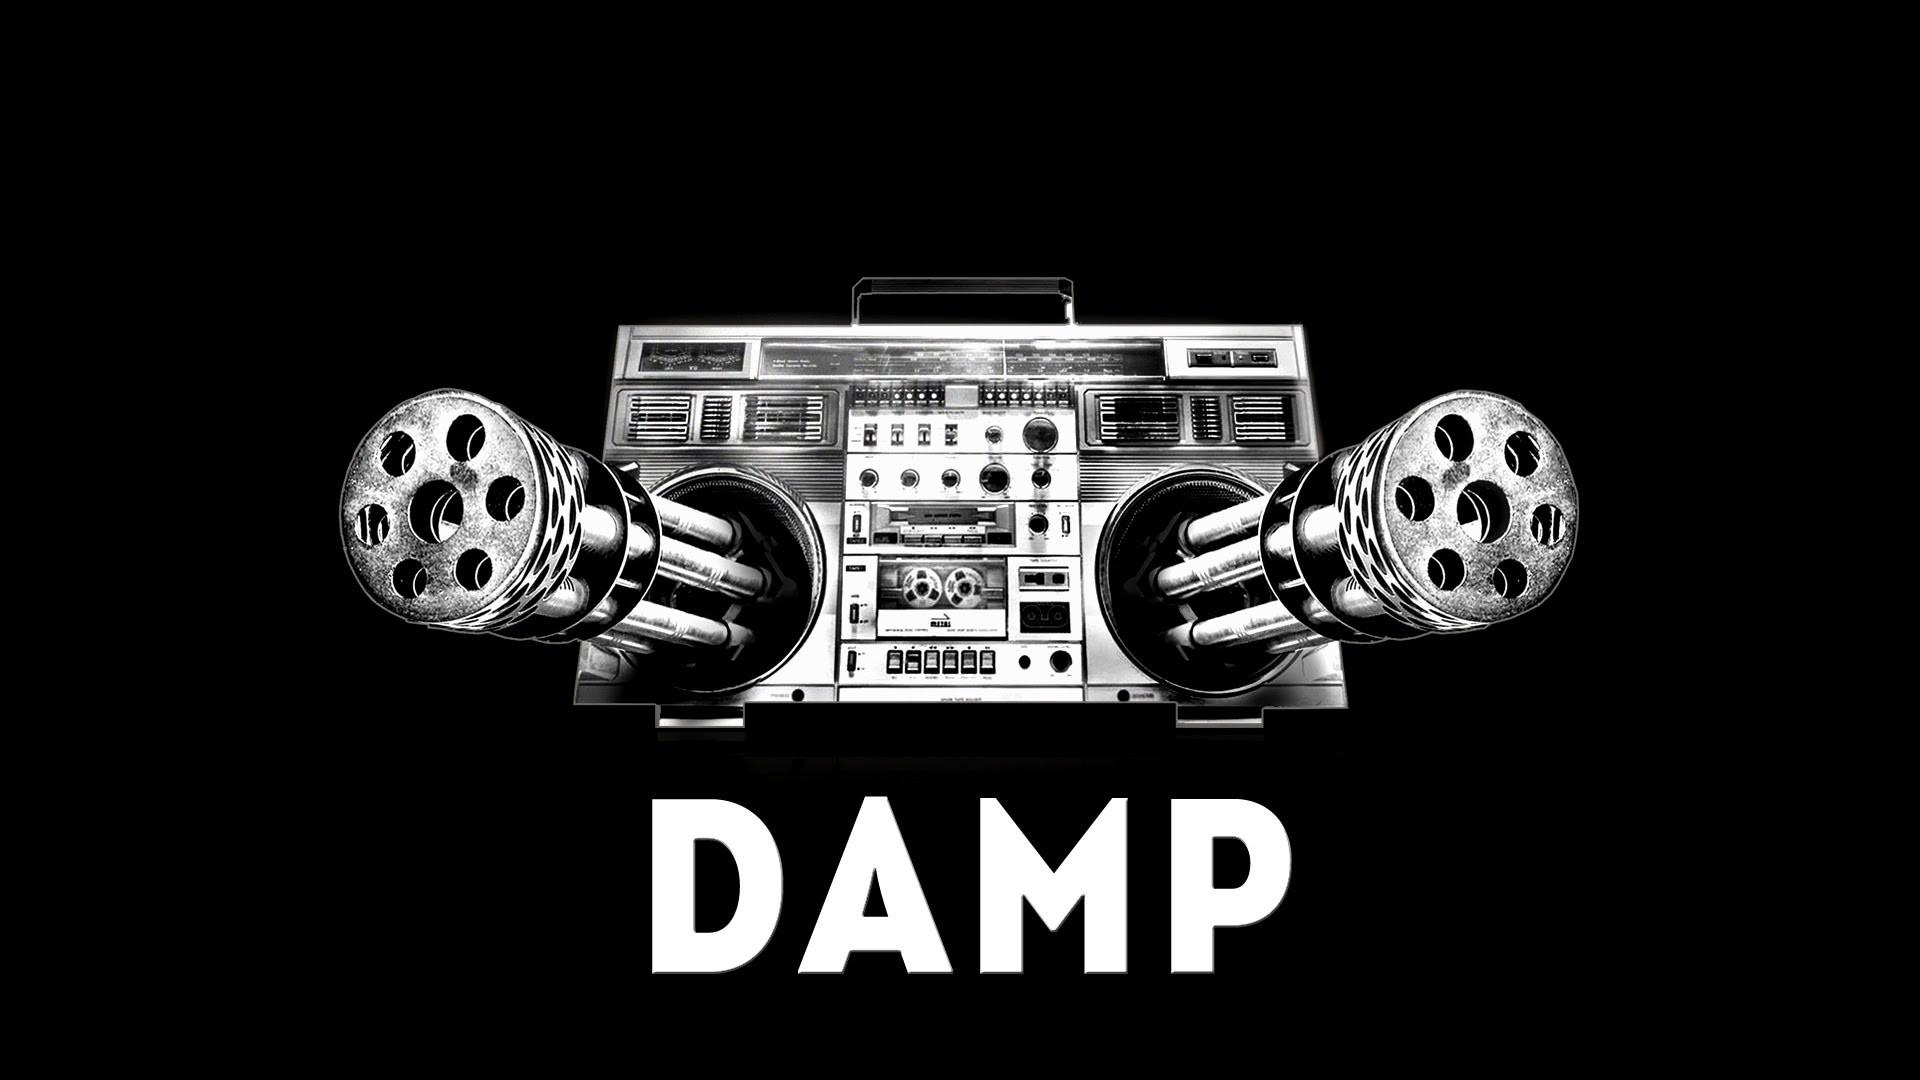 DAMP Fast OldSchool HipHop Old School Hip Hop Wallpaper